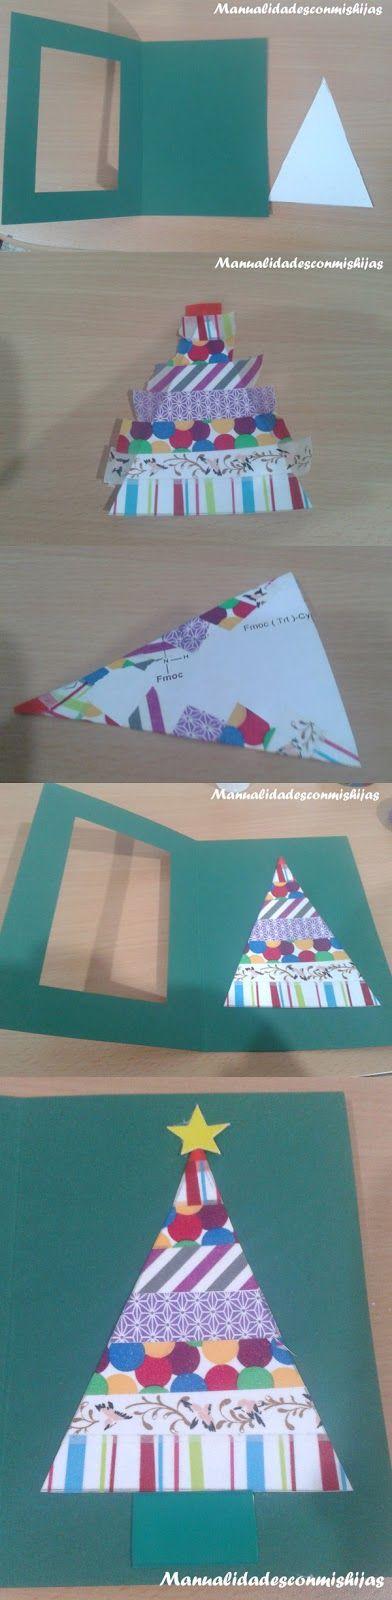 Tarjetas de navidad con whasi-tape